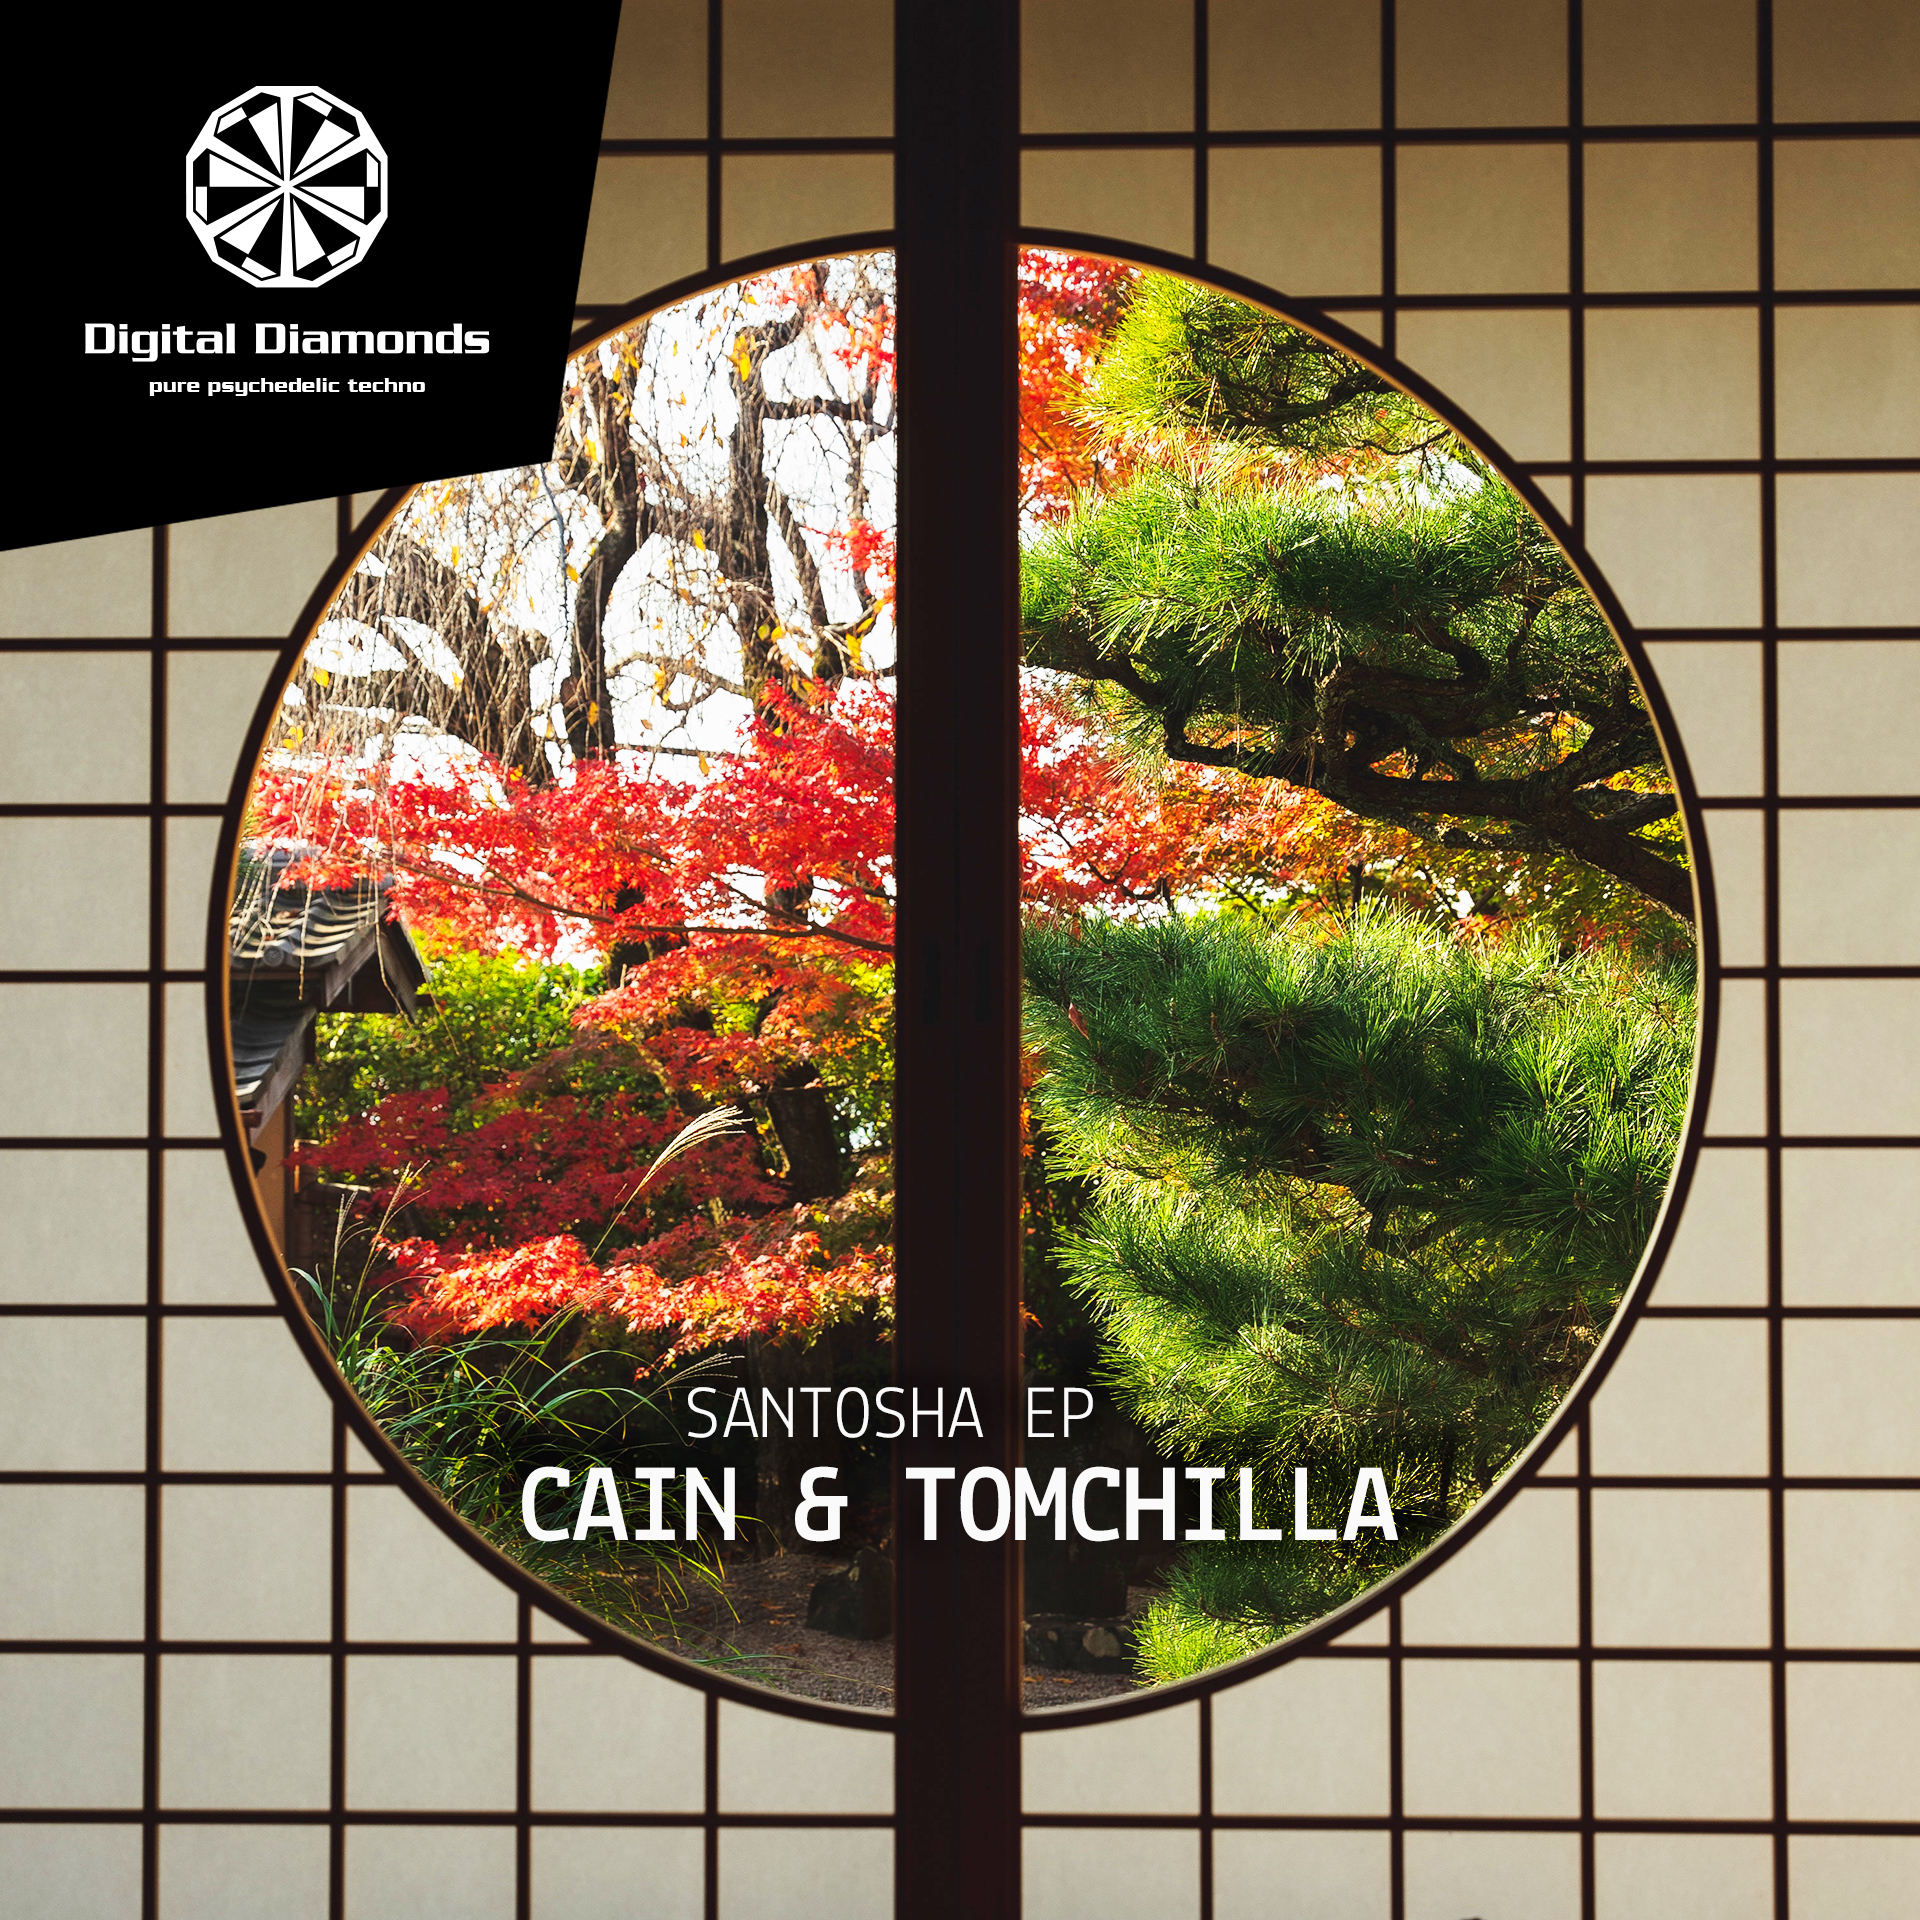 CAIN & Tomchilla – Santosha EP